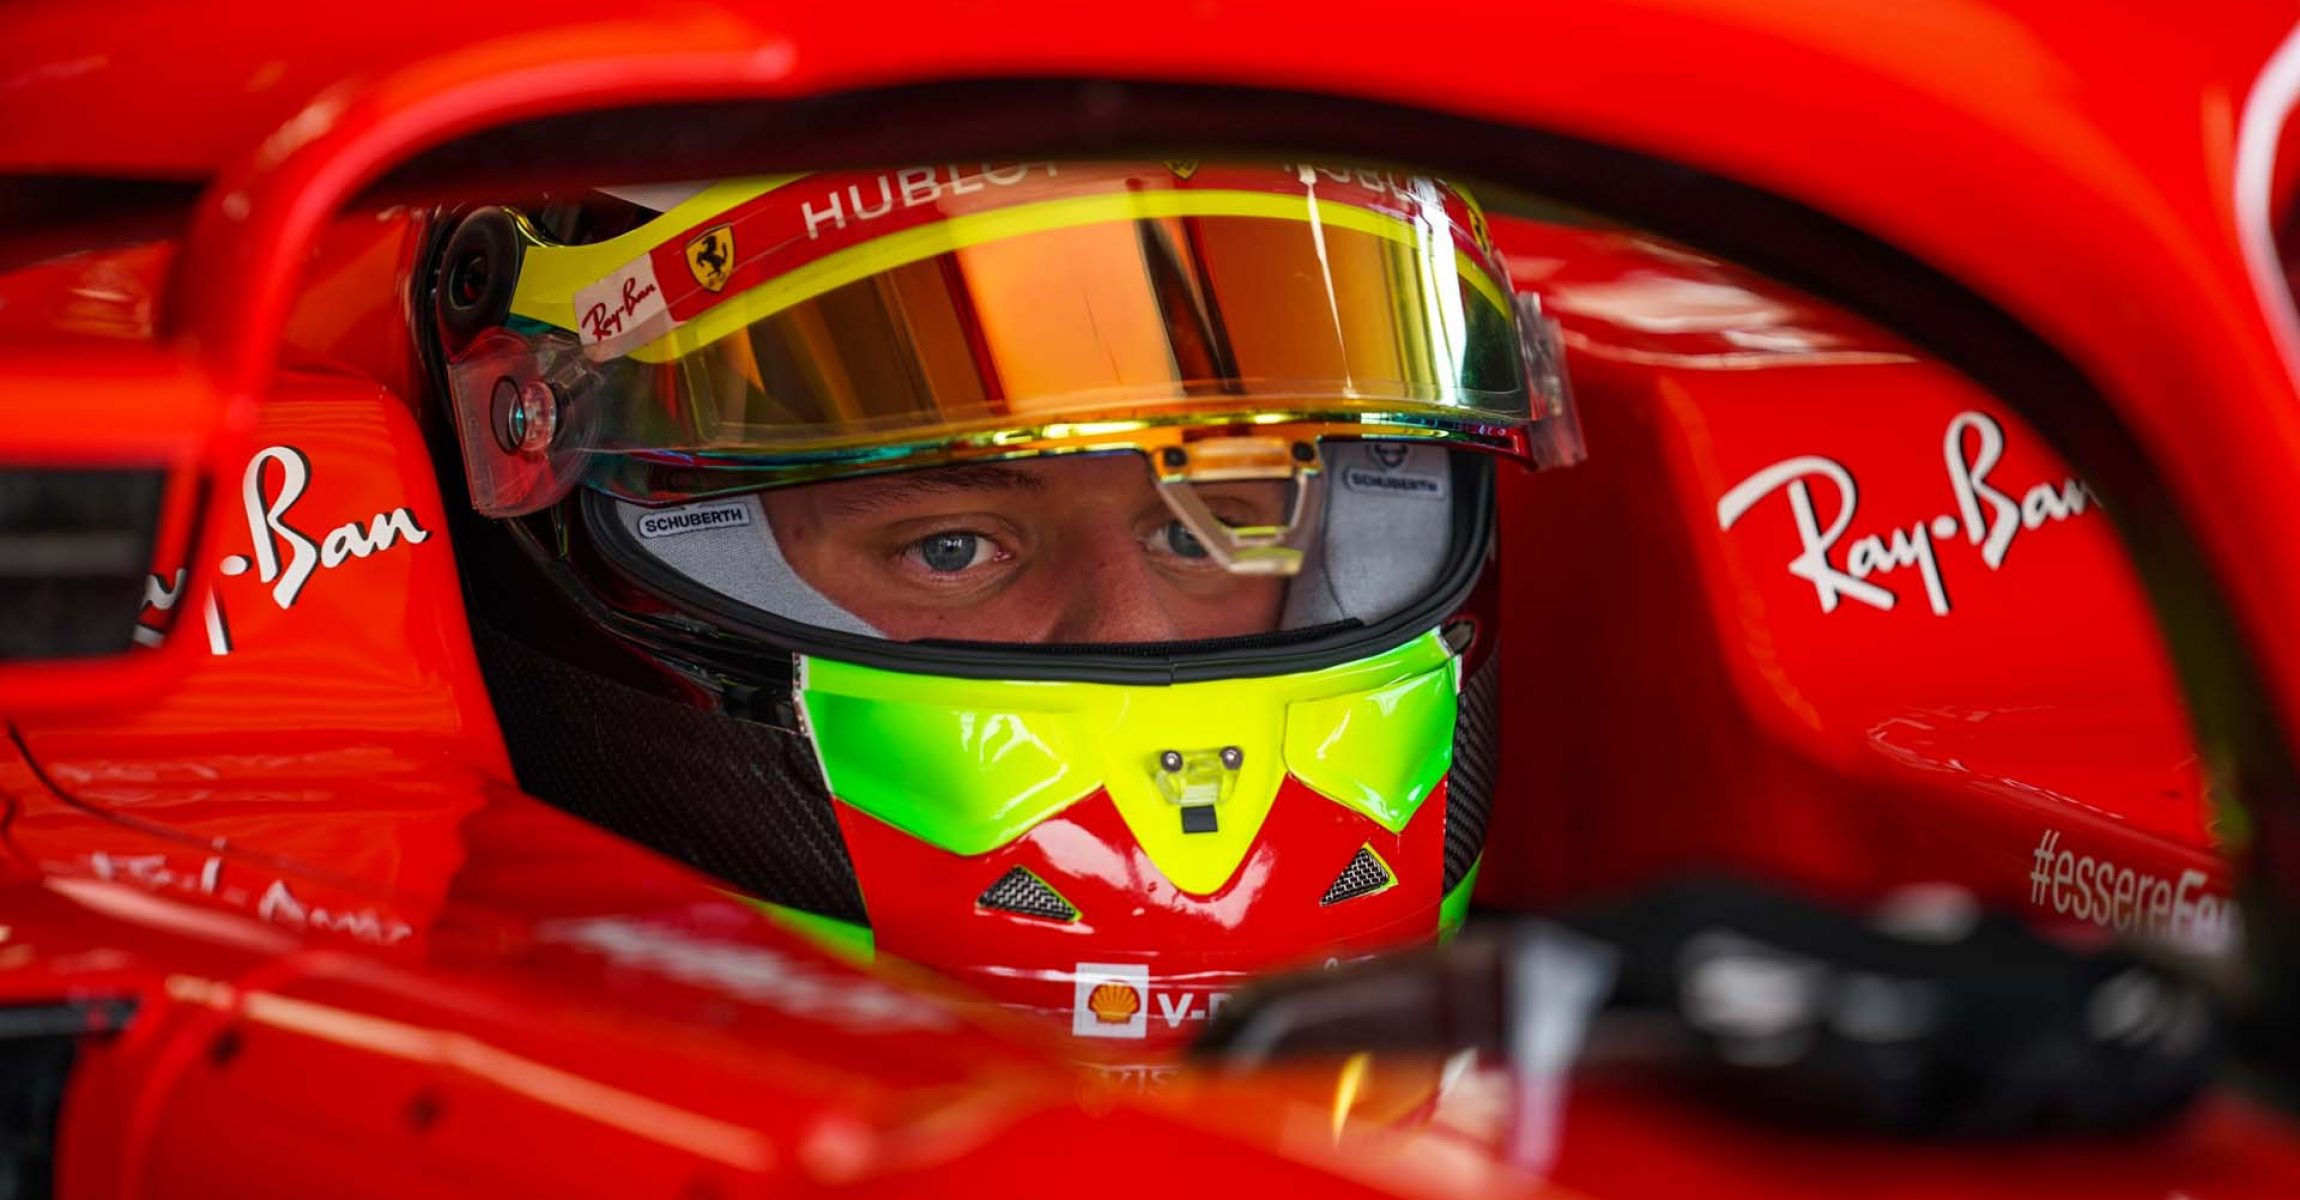 Mick Schumacher, Ferrari, Fiorano, Test, 2020 September